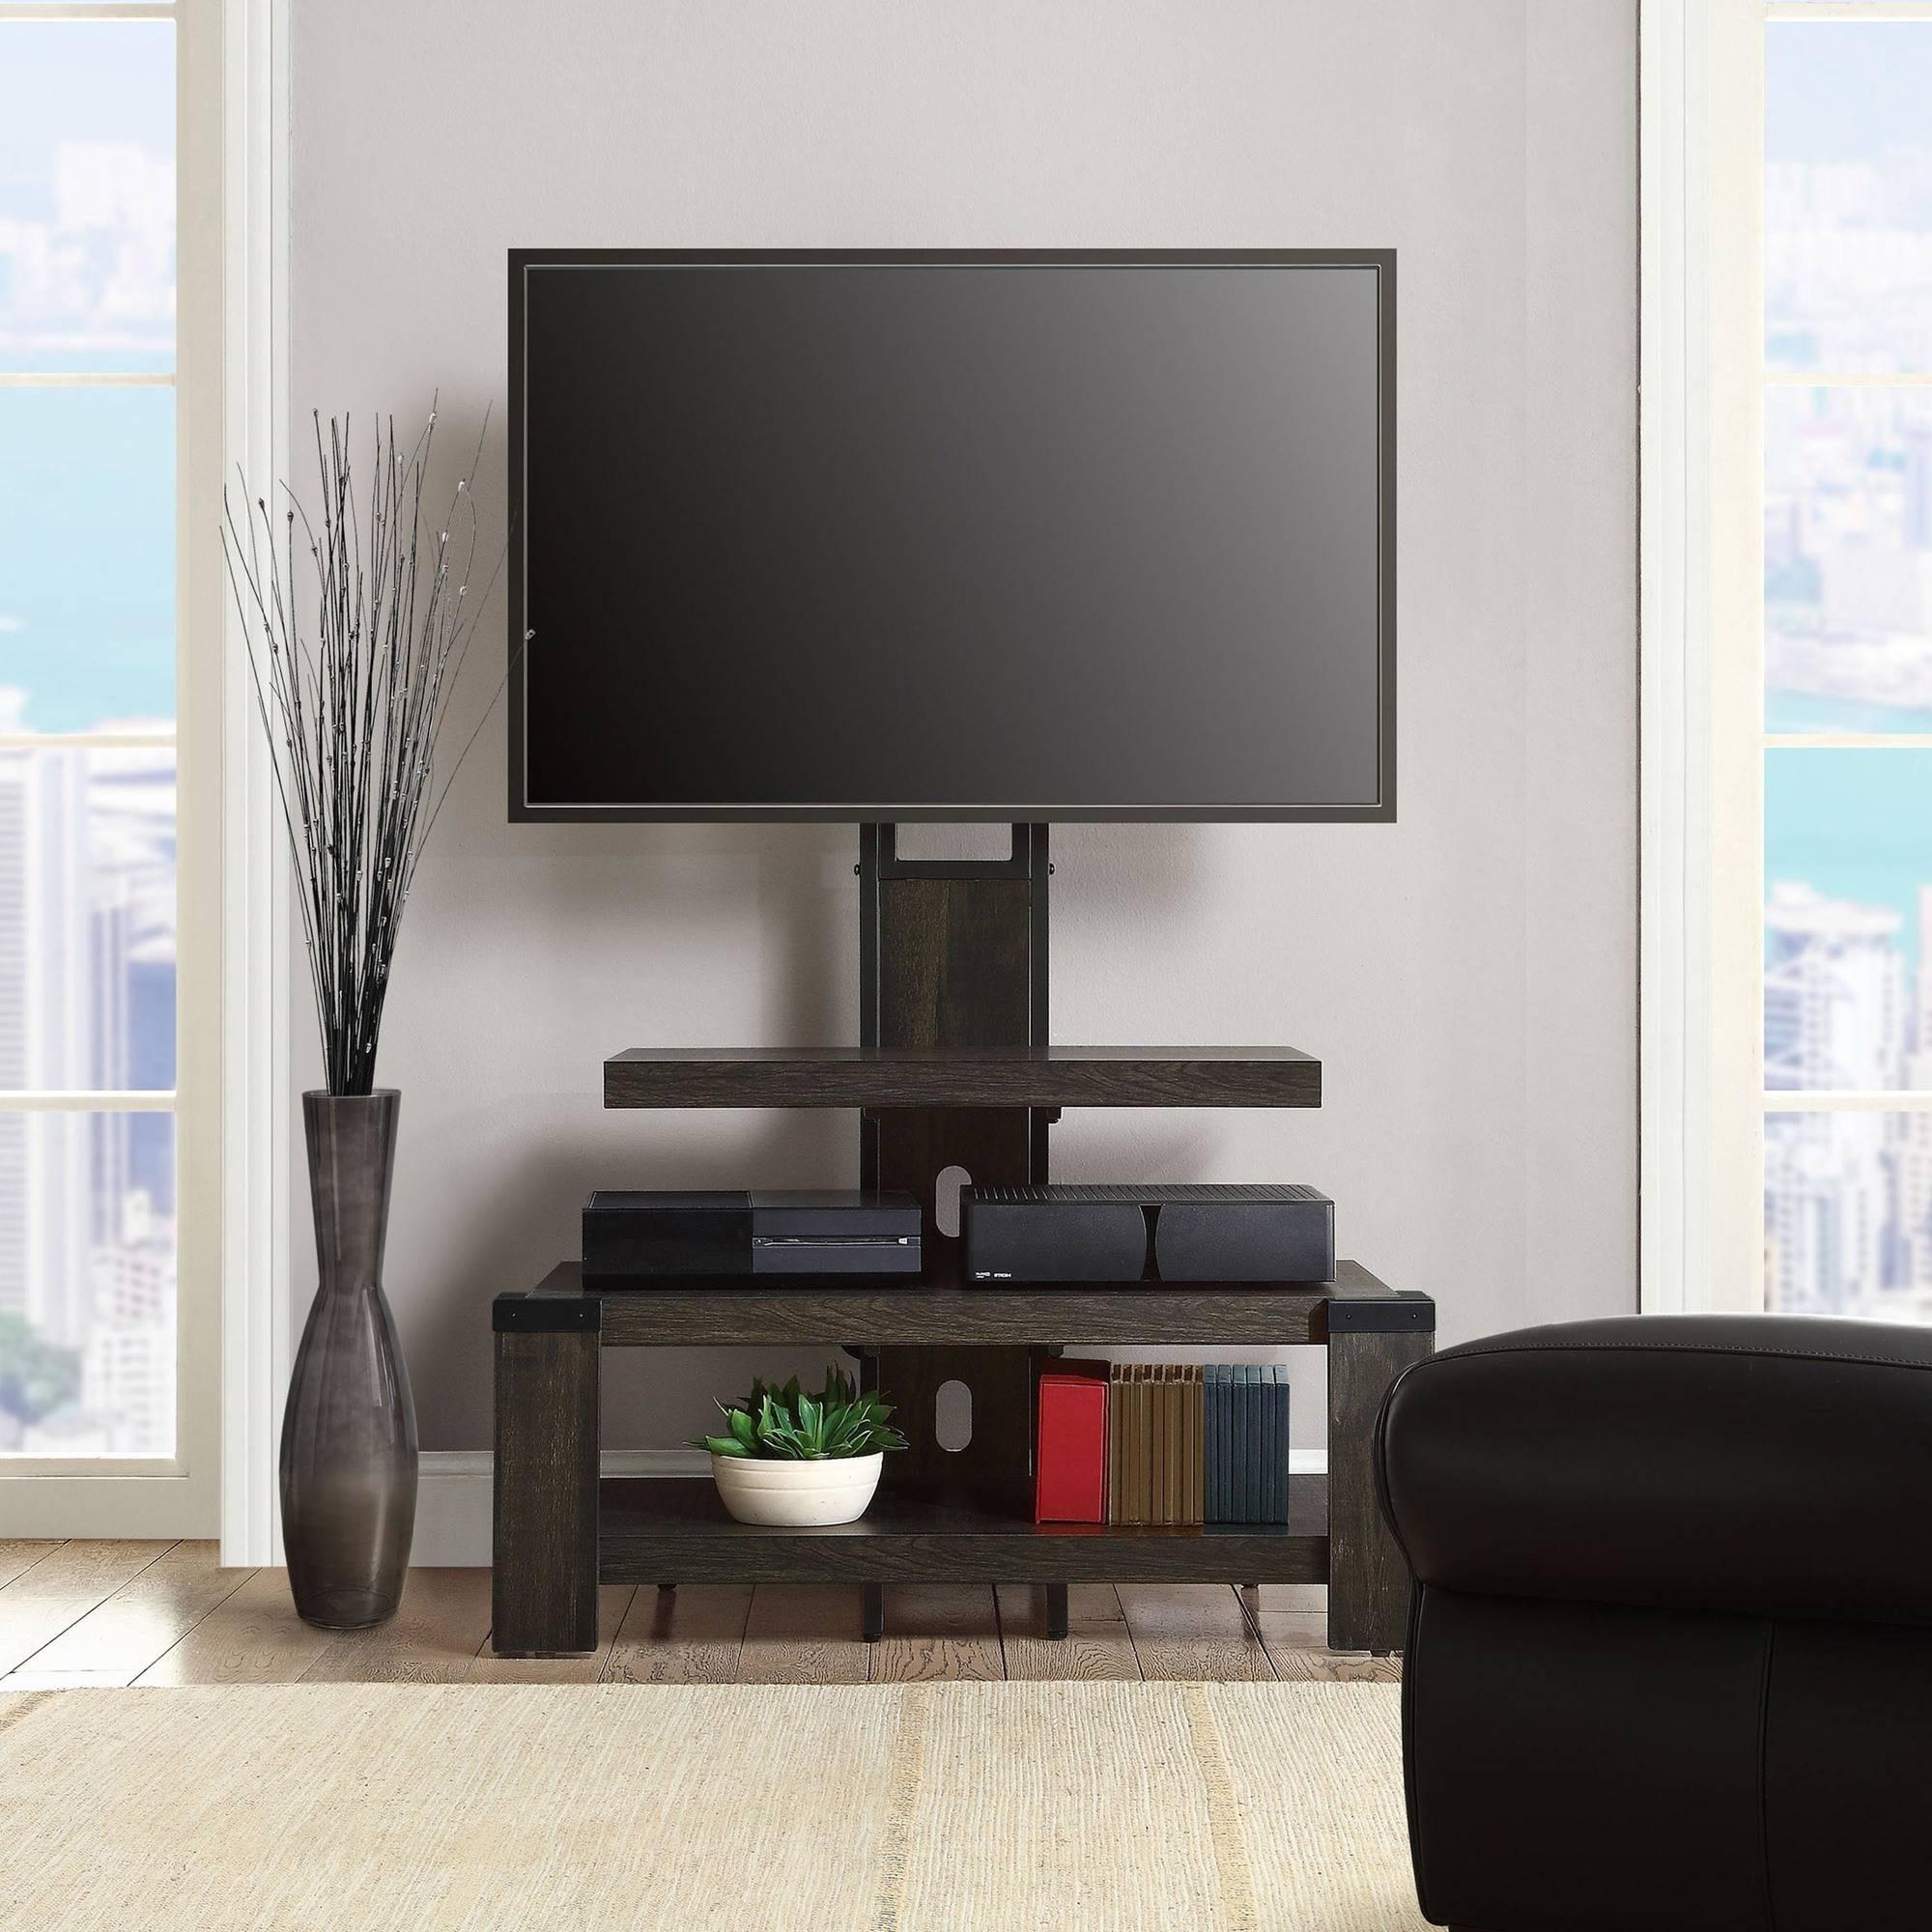 Whalen Shelf Tv Stands (View 2 of 6)